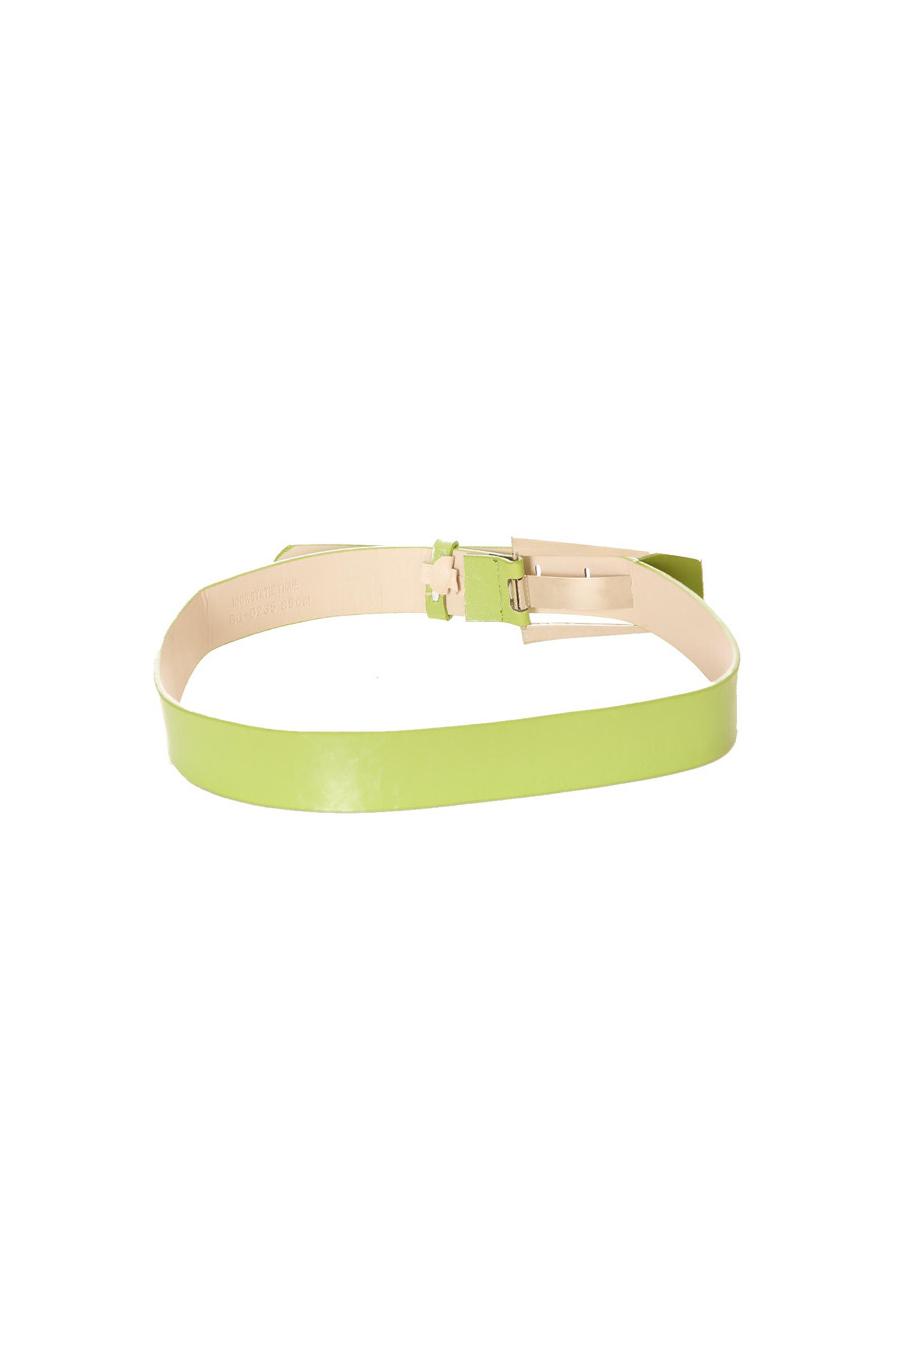 green belt. B6-0235